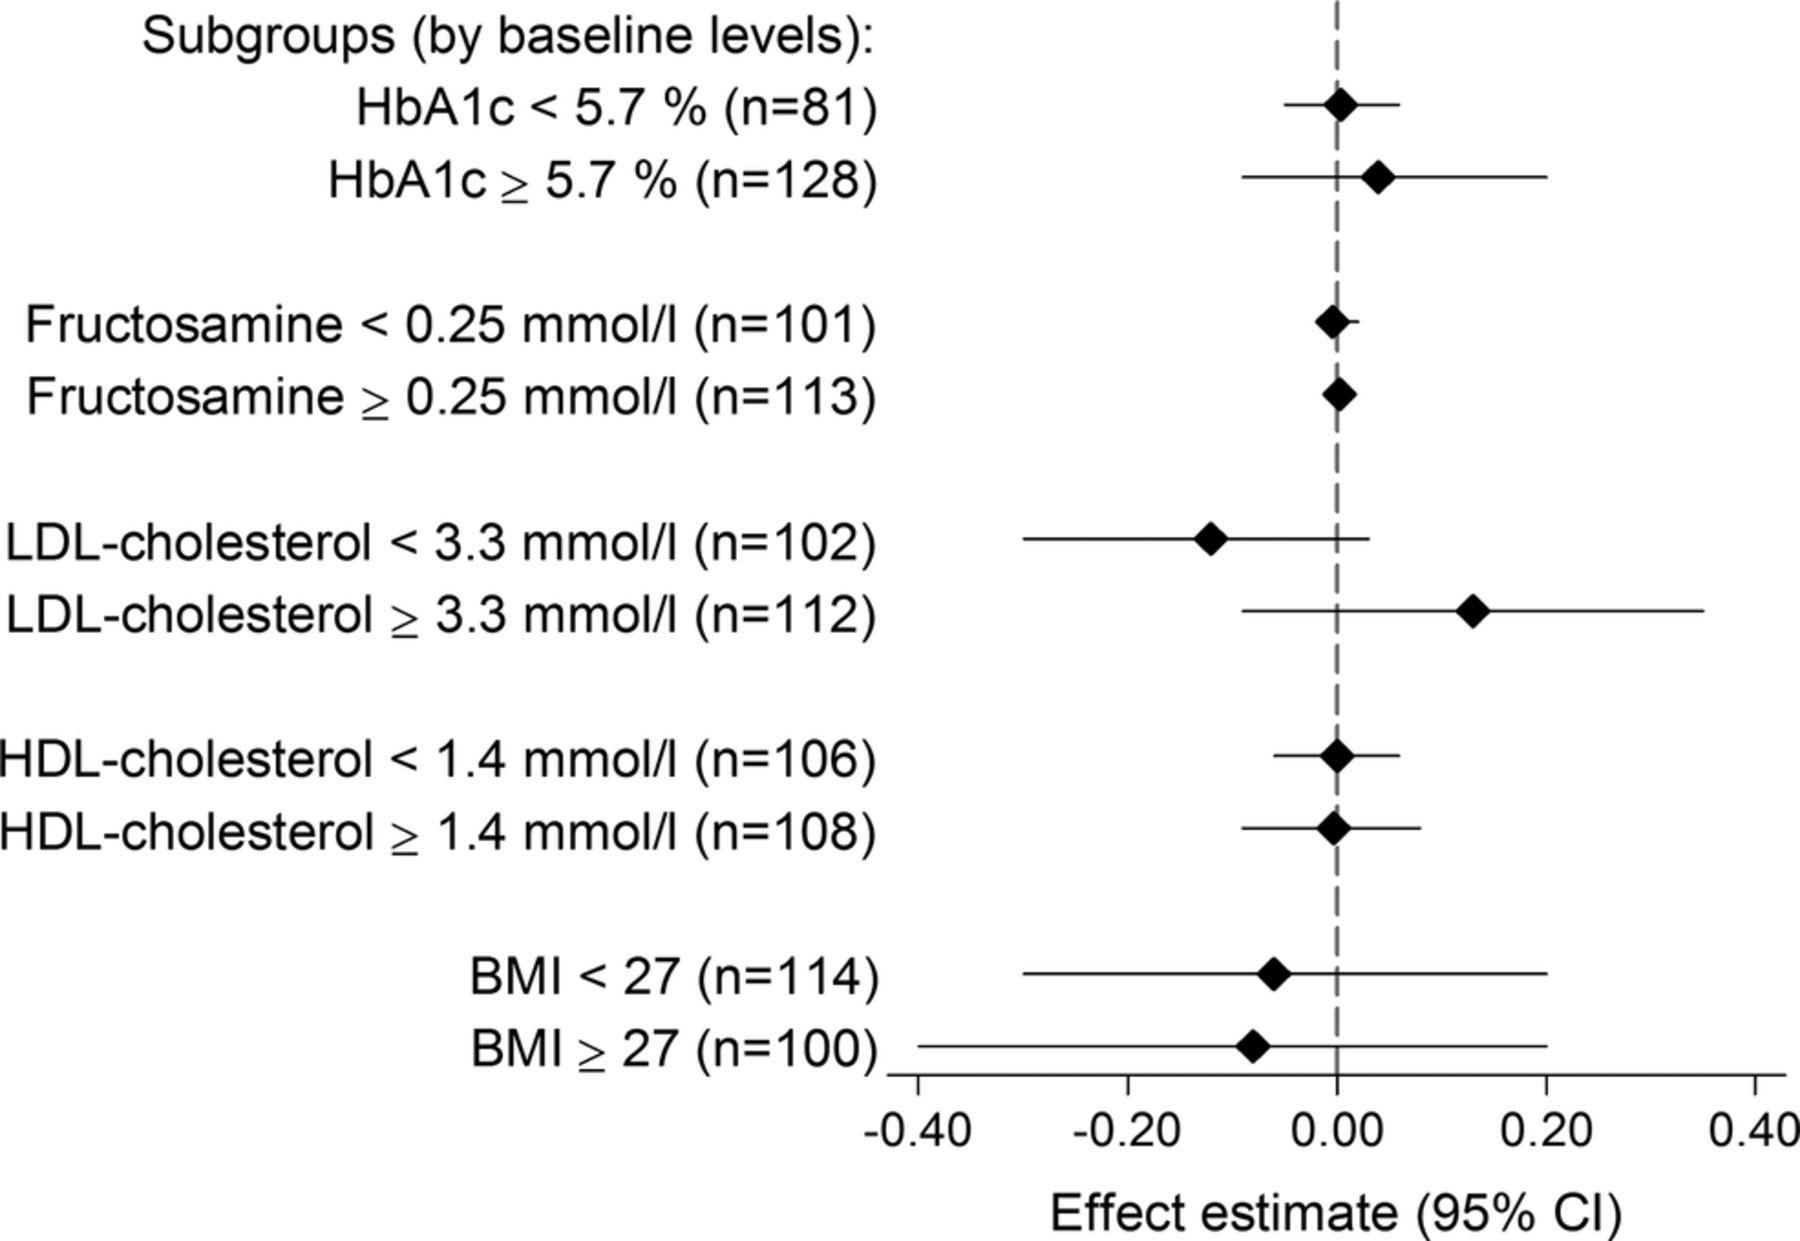 effect of vitamin d3 supplementation on glycated hemoglobin (hba1c